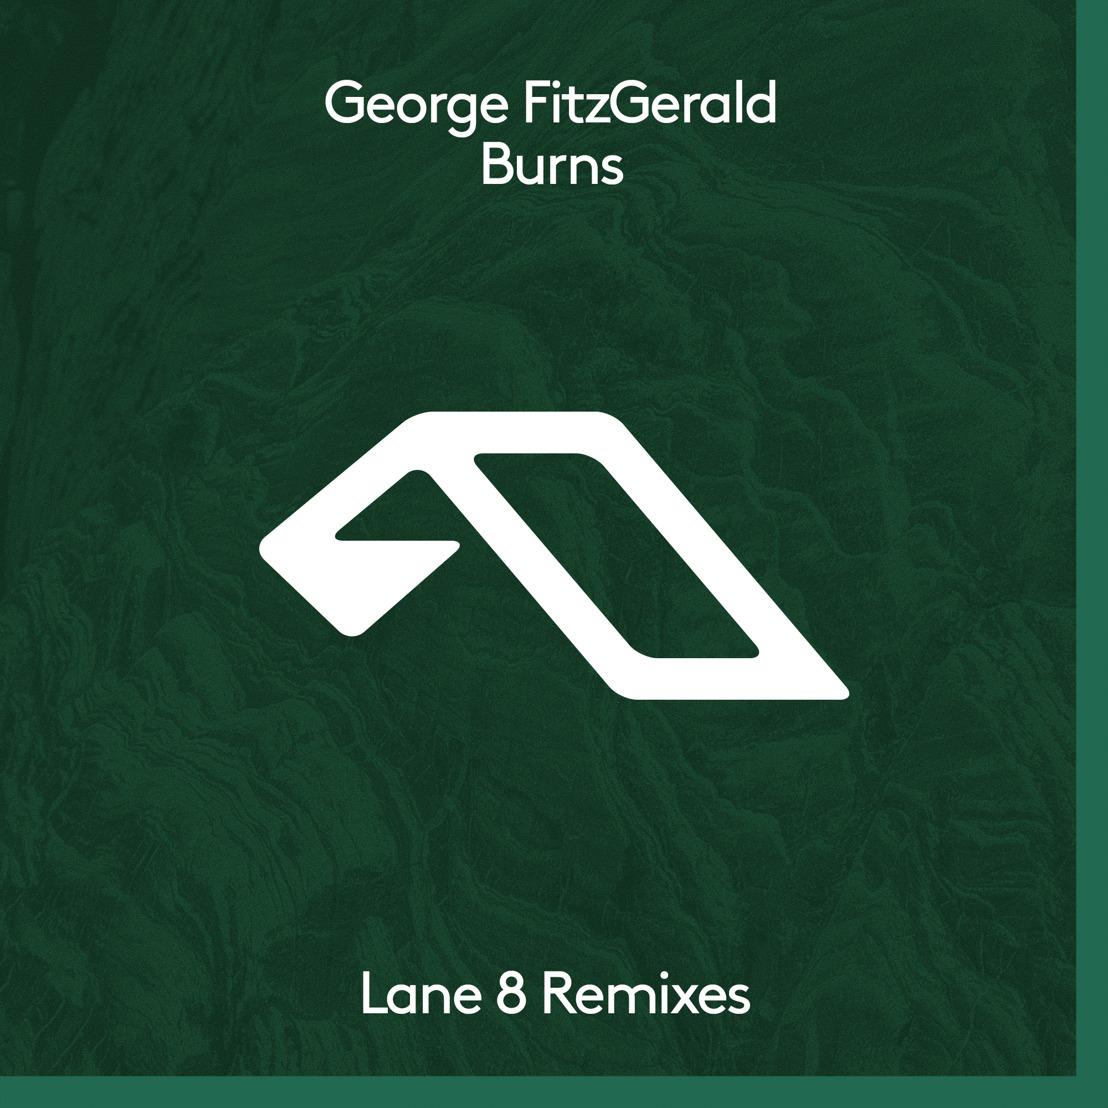 Lane 8 Remixes George FitzGerald's Burns